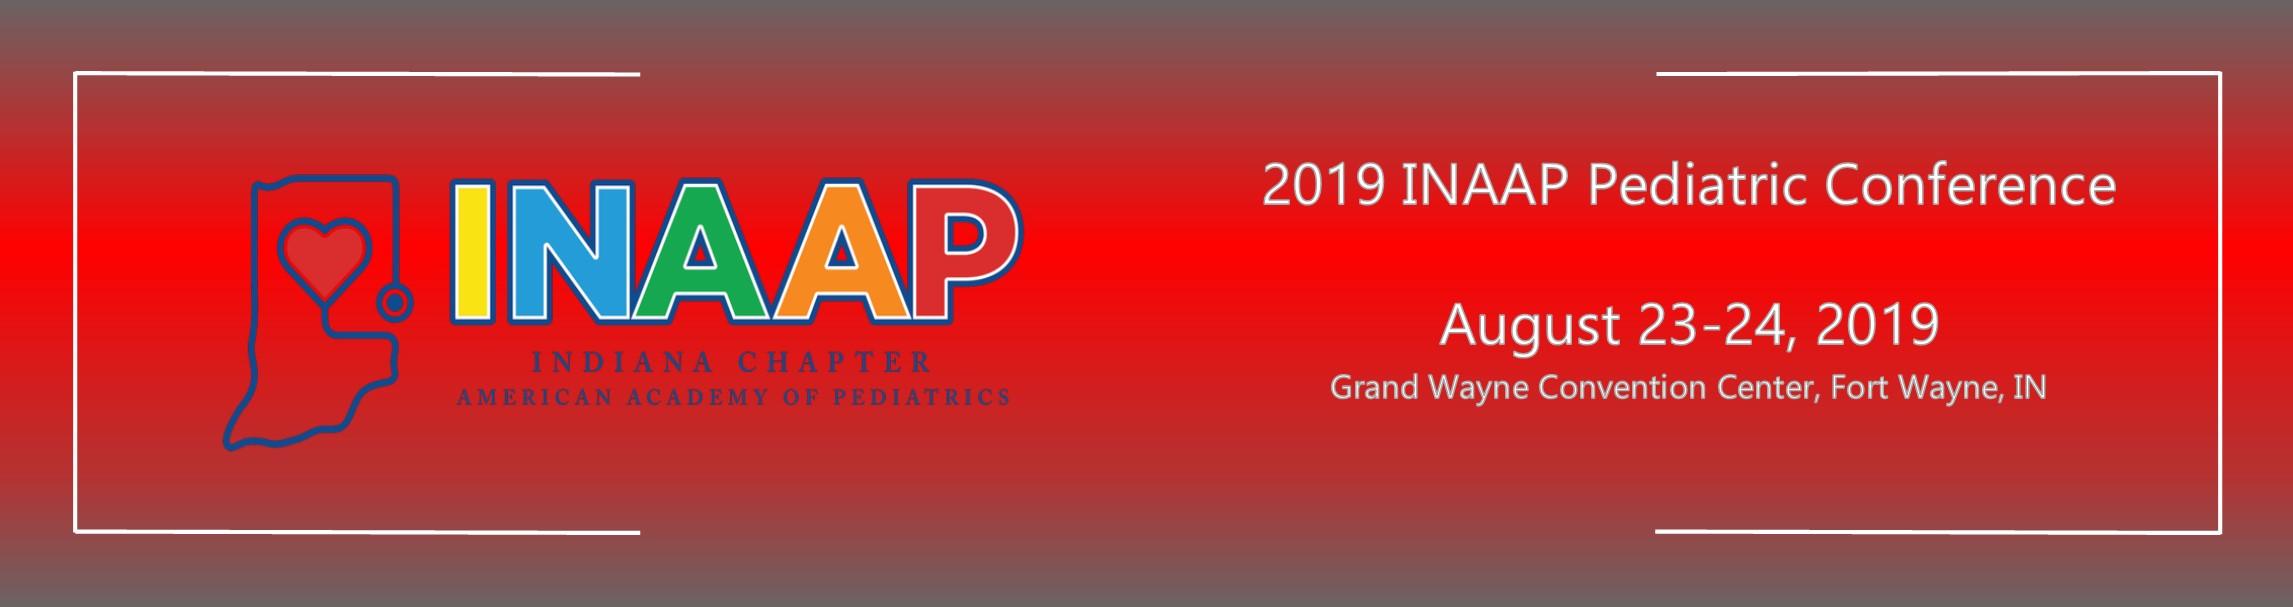 2019 INAAP Pediatric Conference - Indiana University School